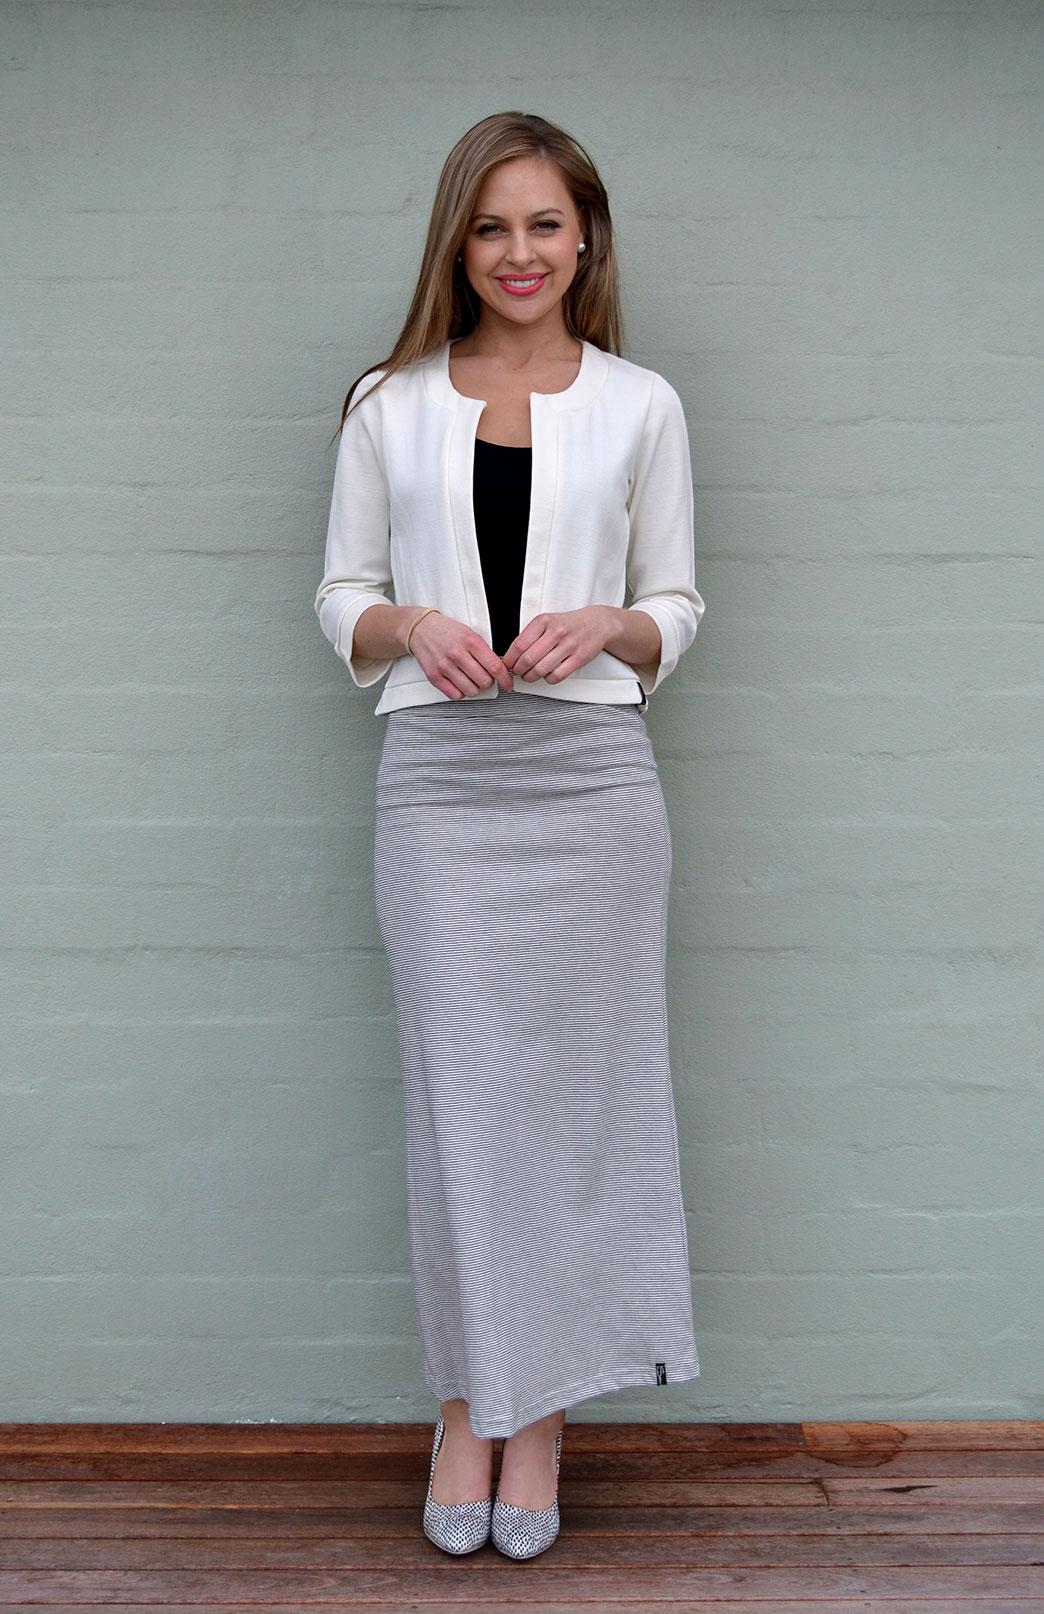 Maxi Skirt - Organic Cotton - Women's Black and White Organic Cotton Maxi Skirt with elastic waistband - Smitten Merino Tasmania Australia